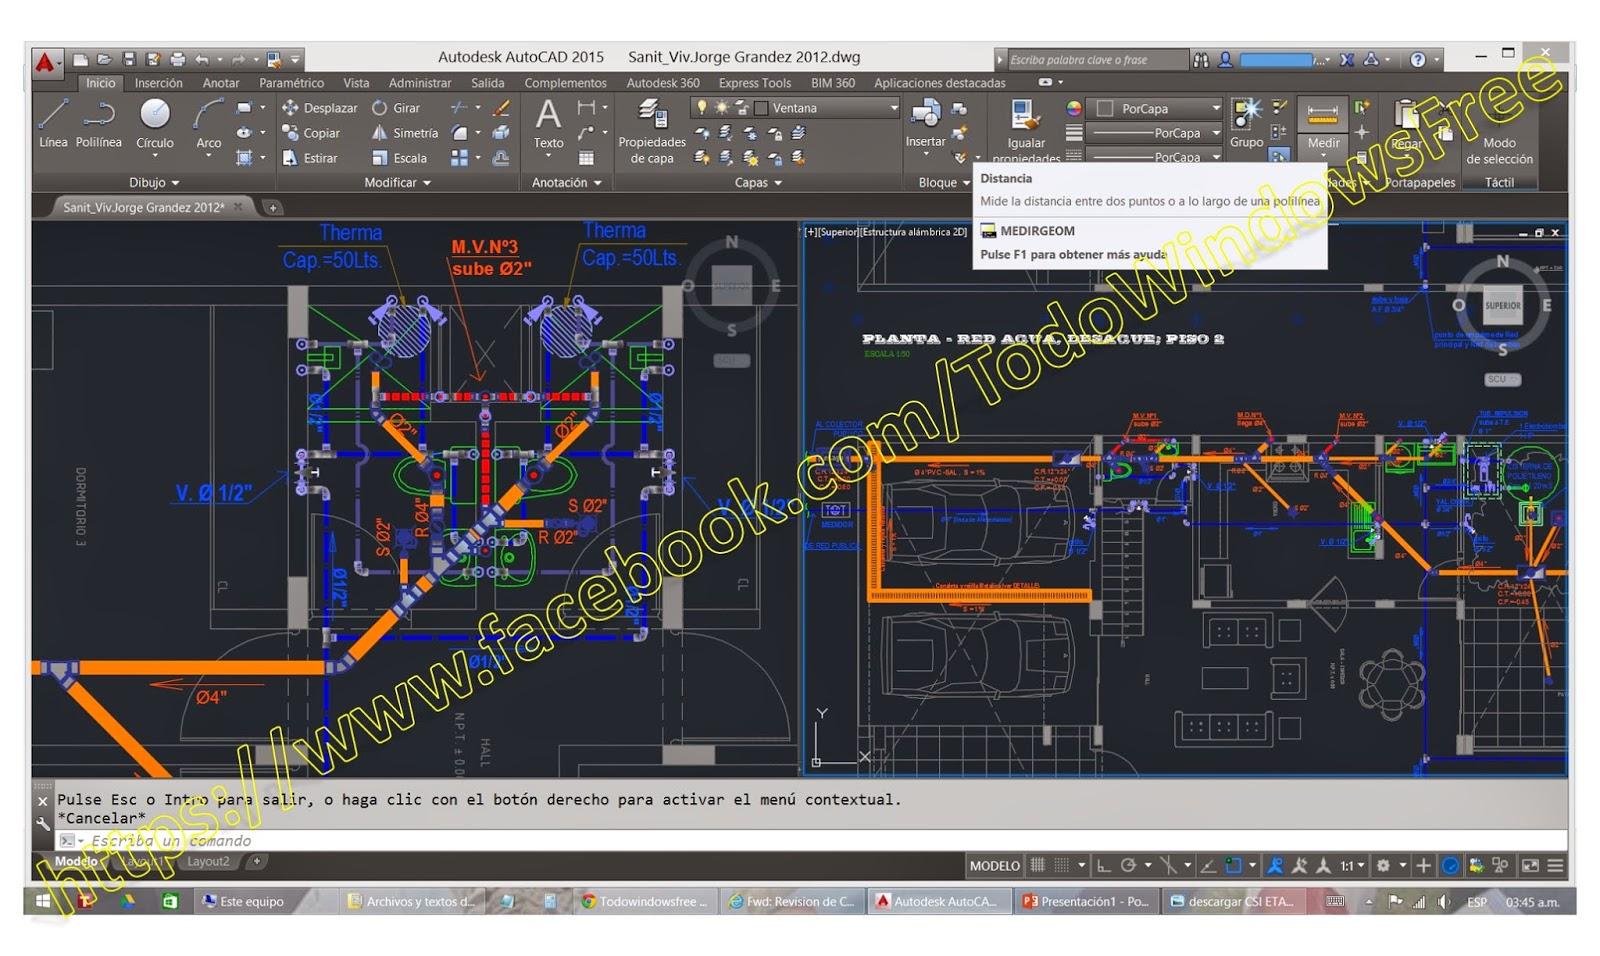 Image Descargar Autodesk Autocad 2015 Espa Ol Crack Keygen 32 64